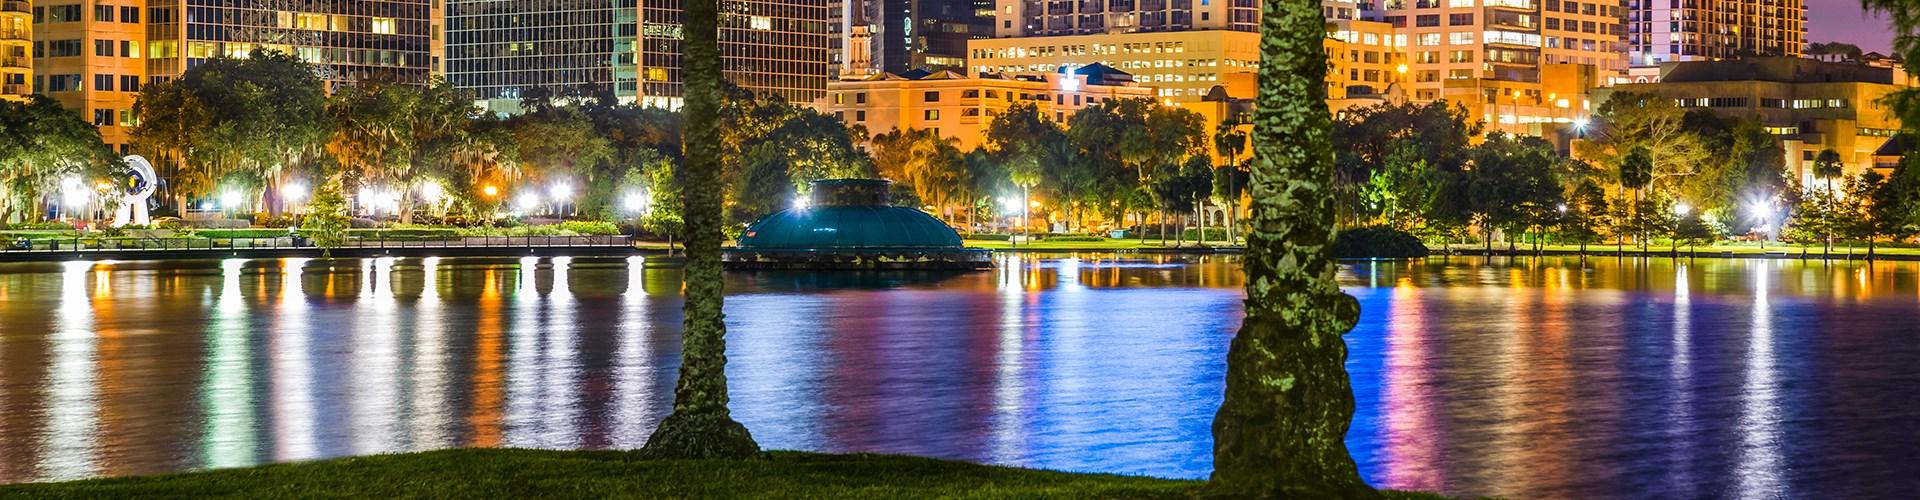 Lake Eola in downtown Orlando at night.